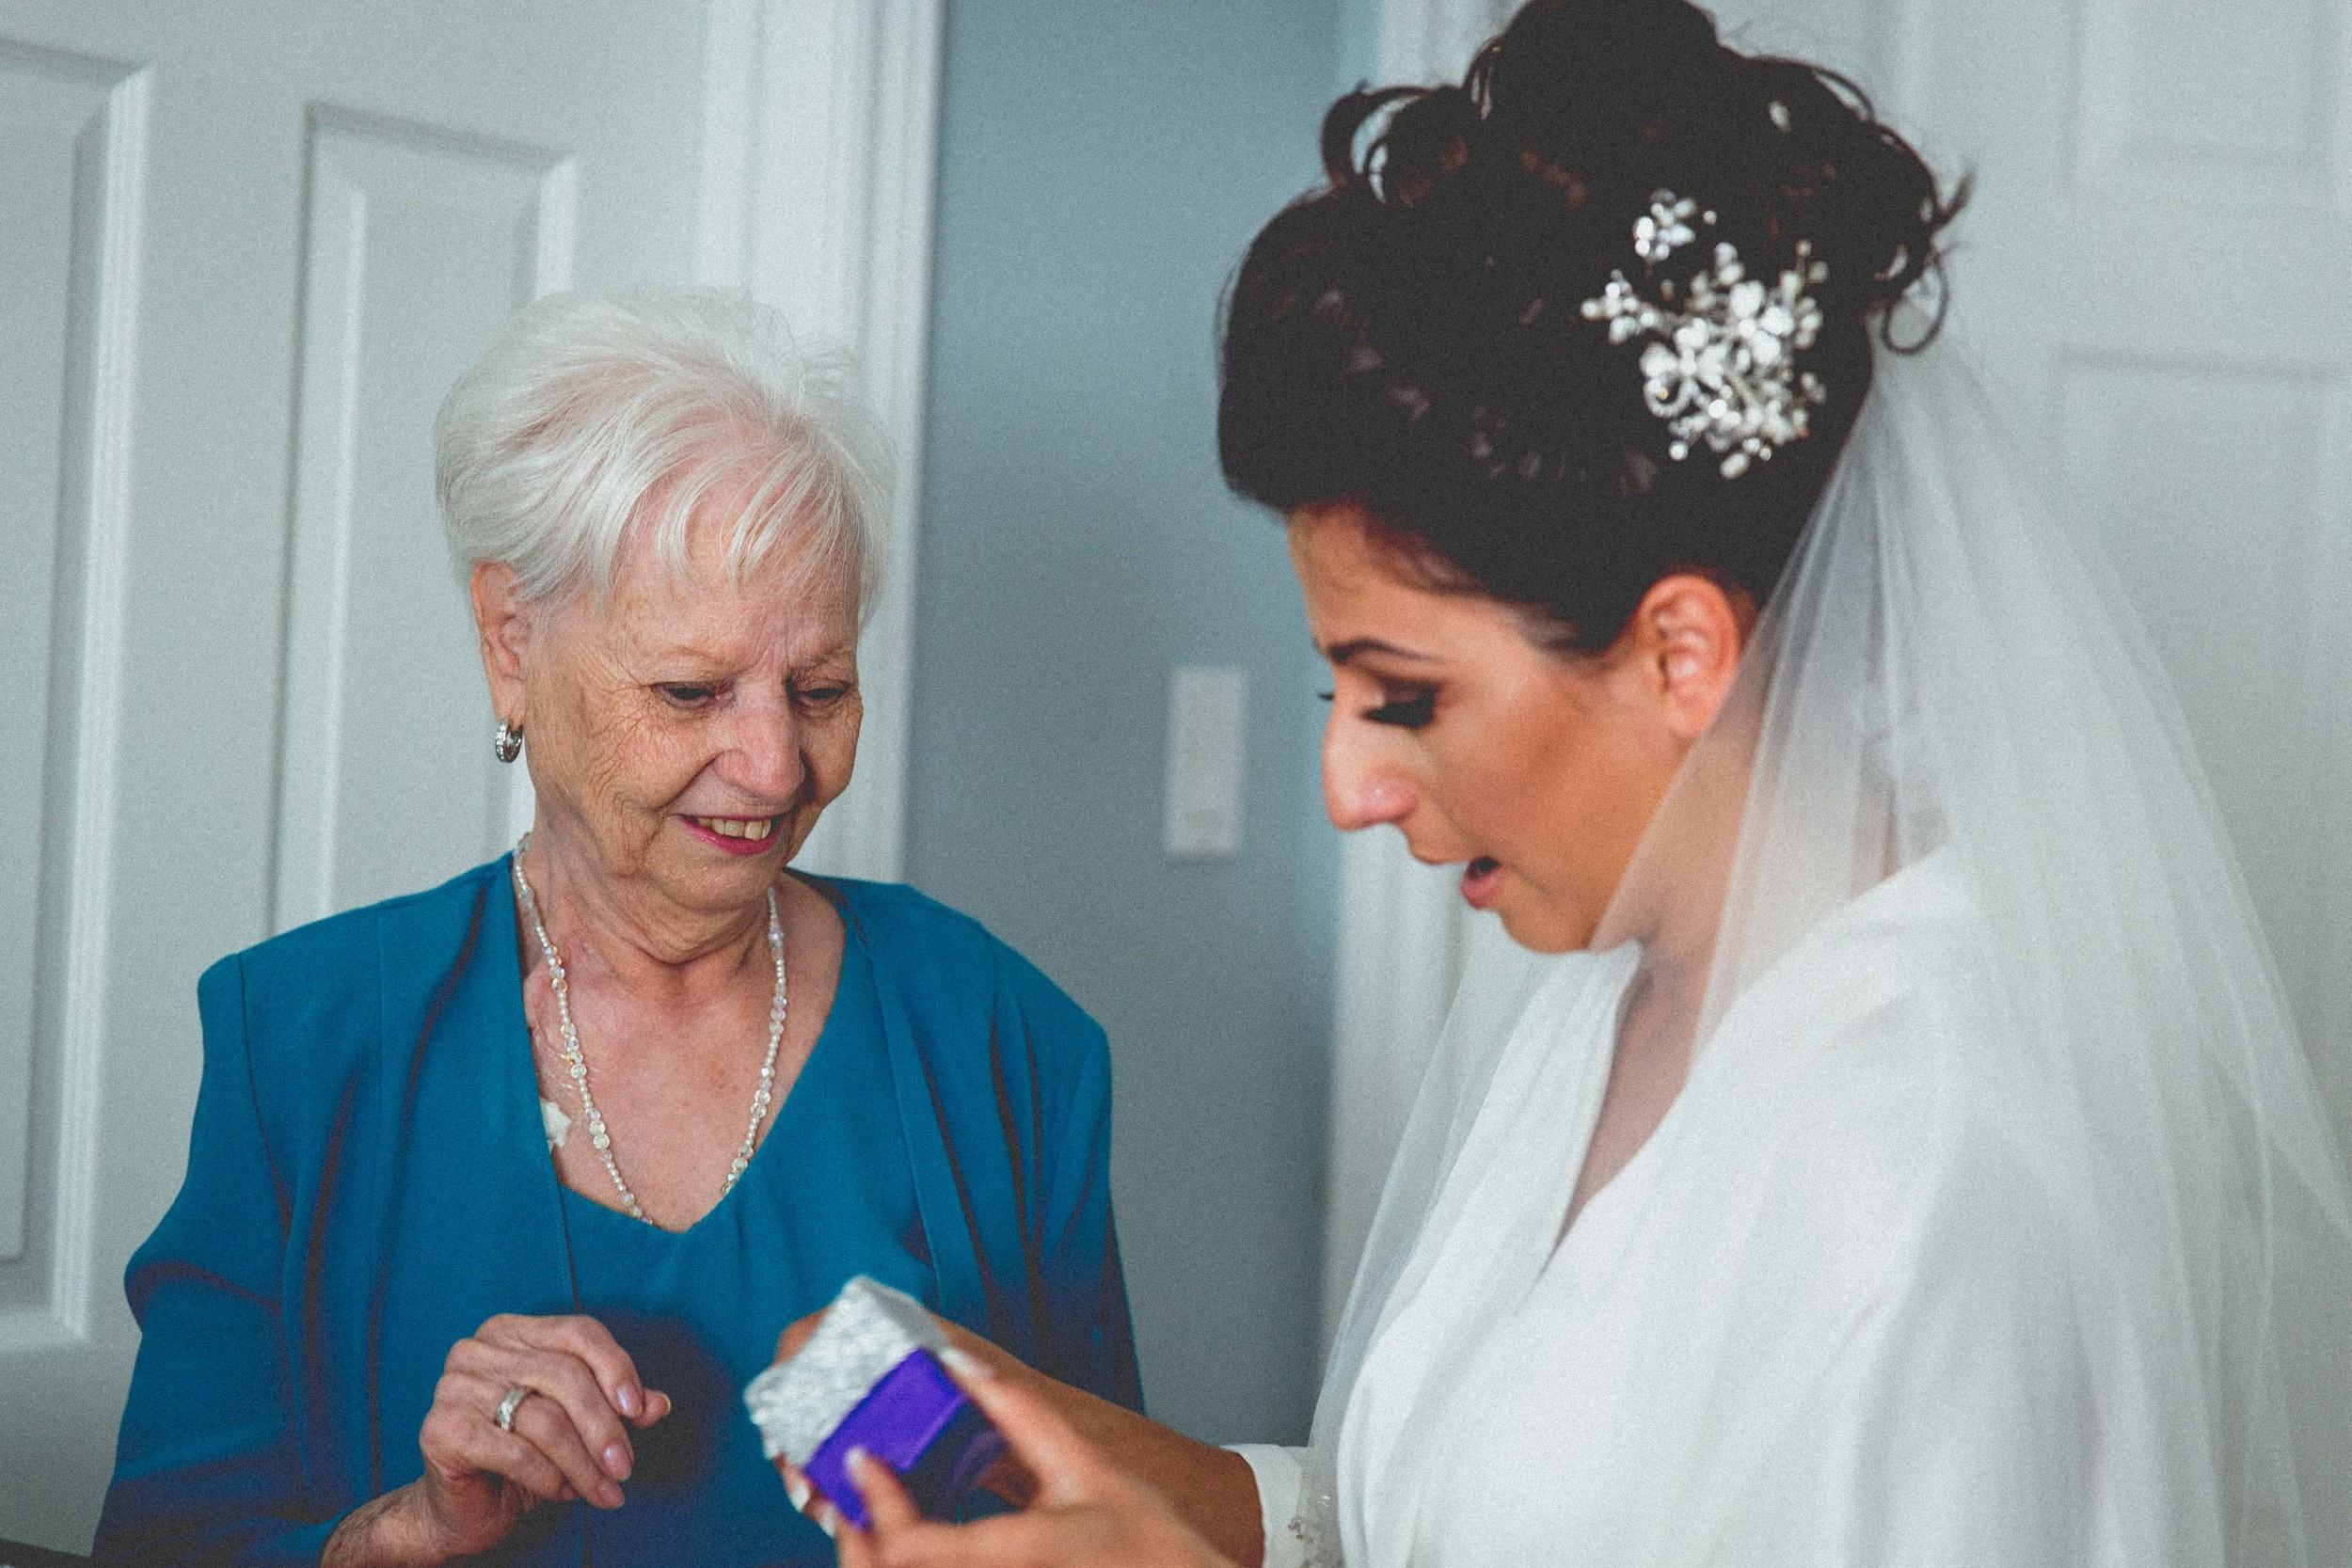 Toronto Wedding Photography | Caterina & Elvis, Pickering catholic wedding (13 of 39).jpg